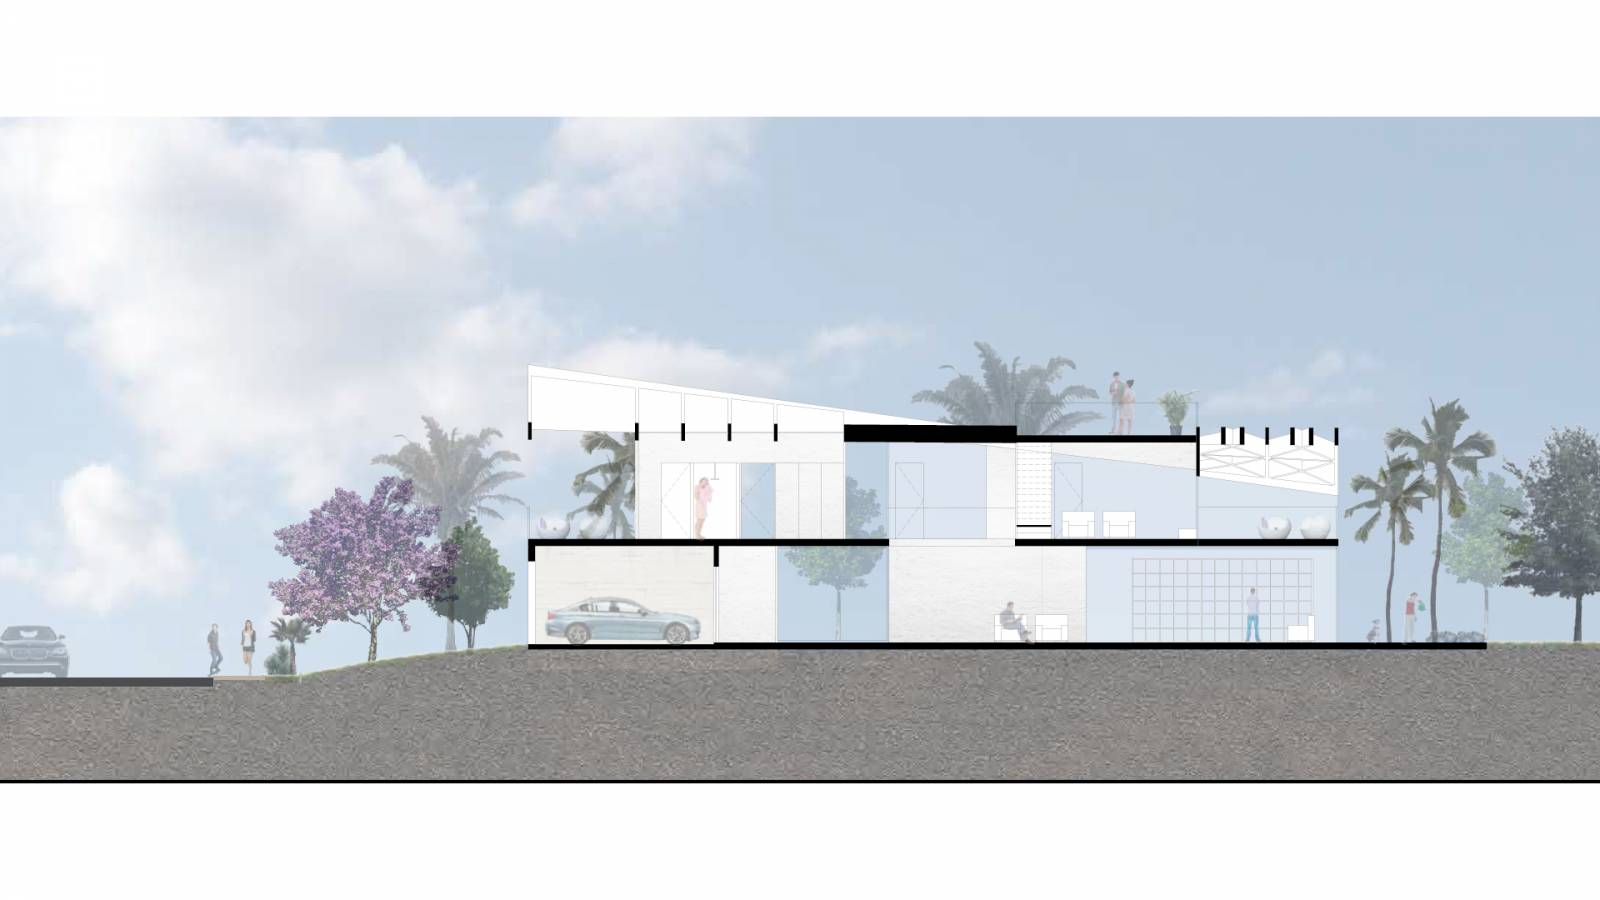 6 case study houses - SPOL